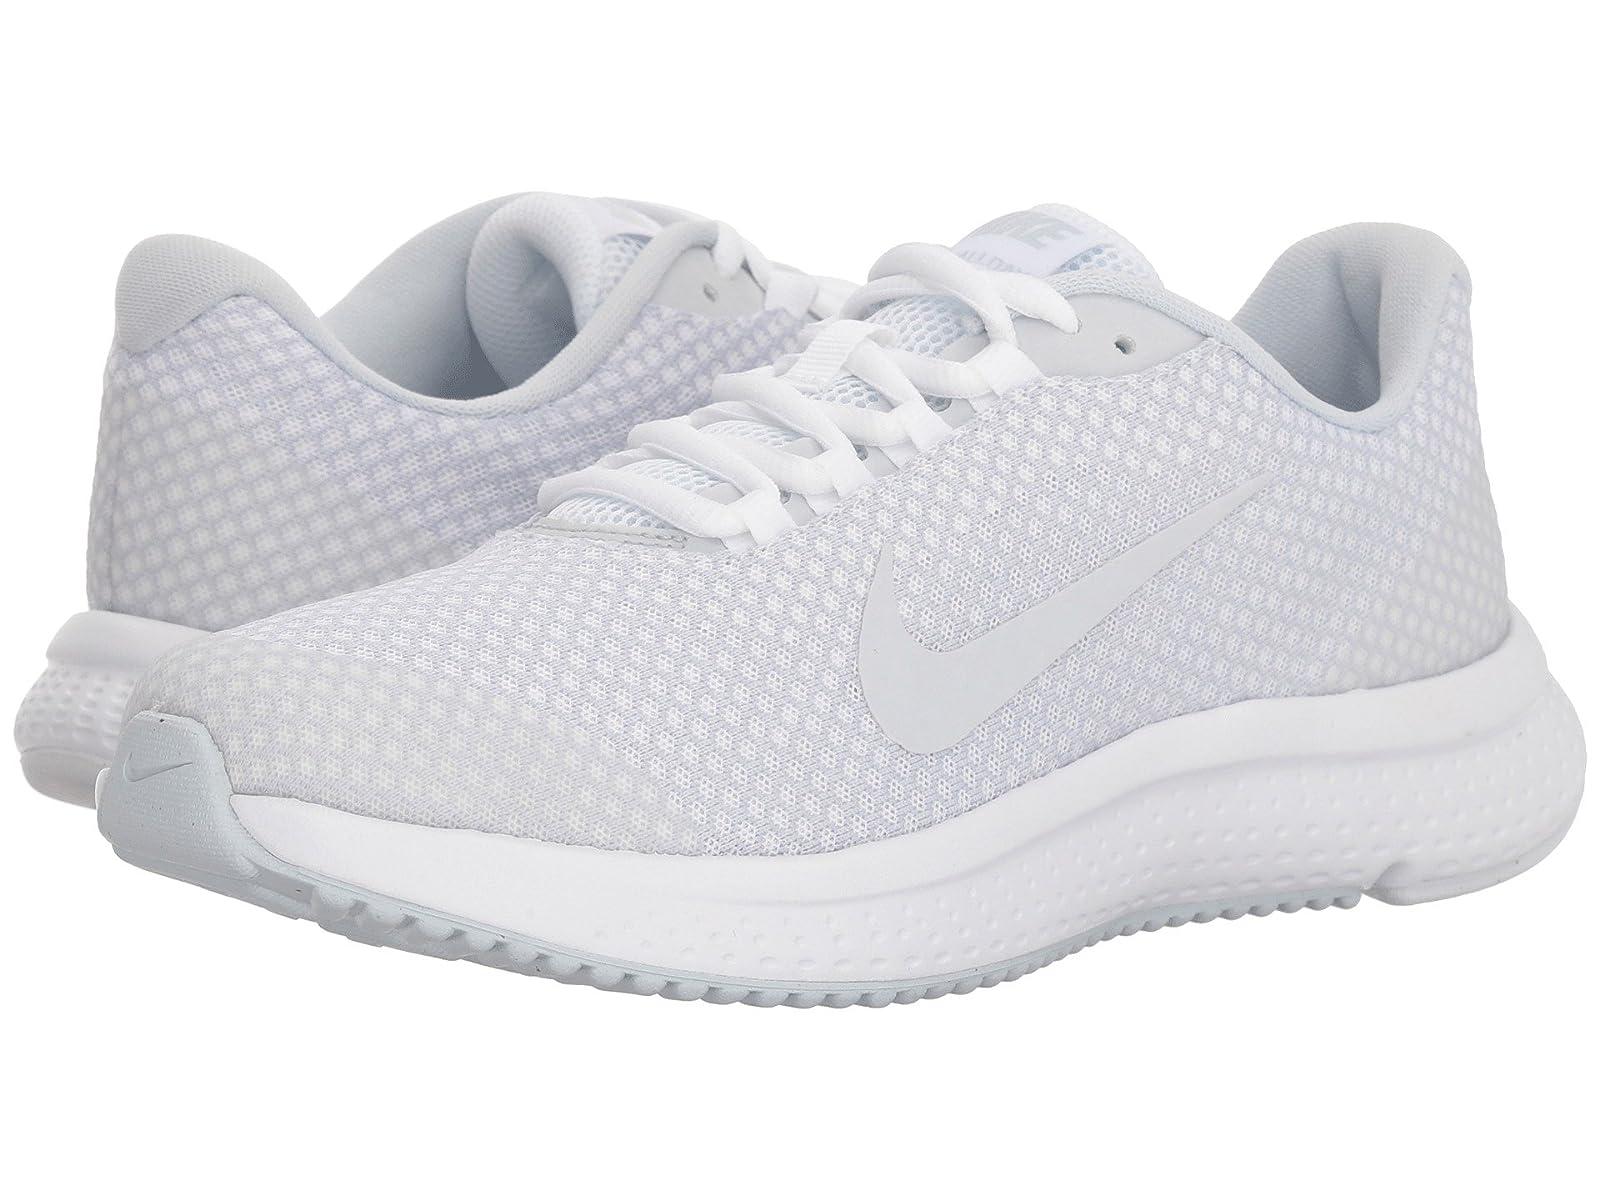 Nike RunAllDayAtmospheric grades have affordable shoes